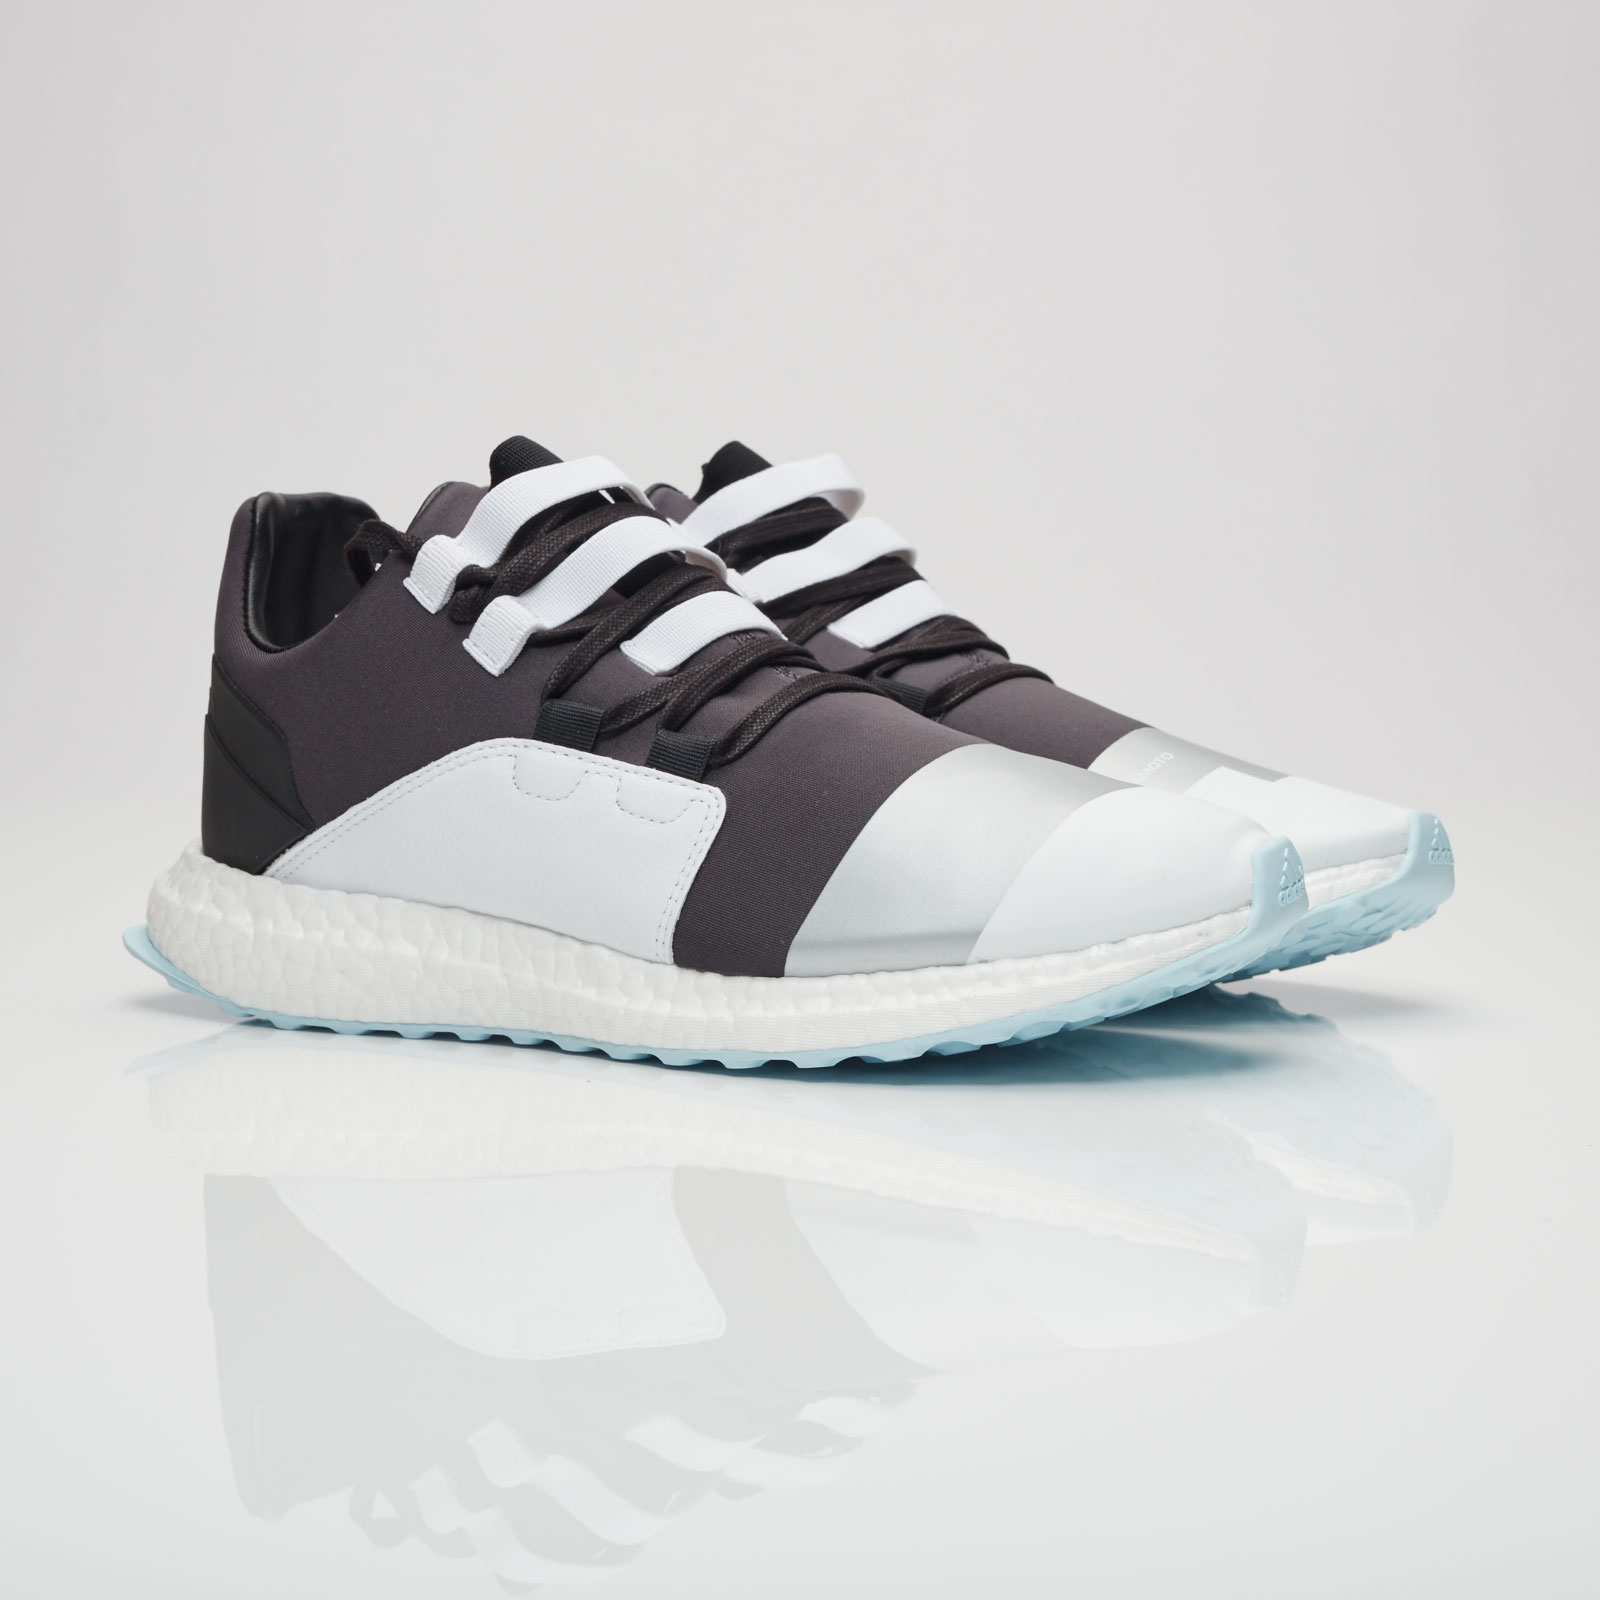 5d916b1c14f87 adidas Kozoko Low - By2633 - Sneakersnstuff